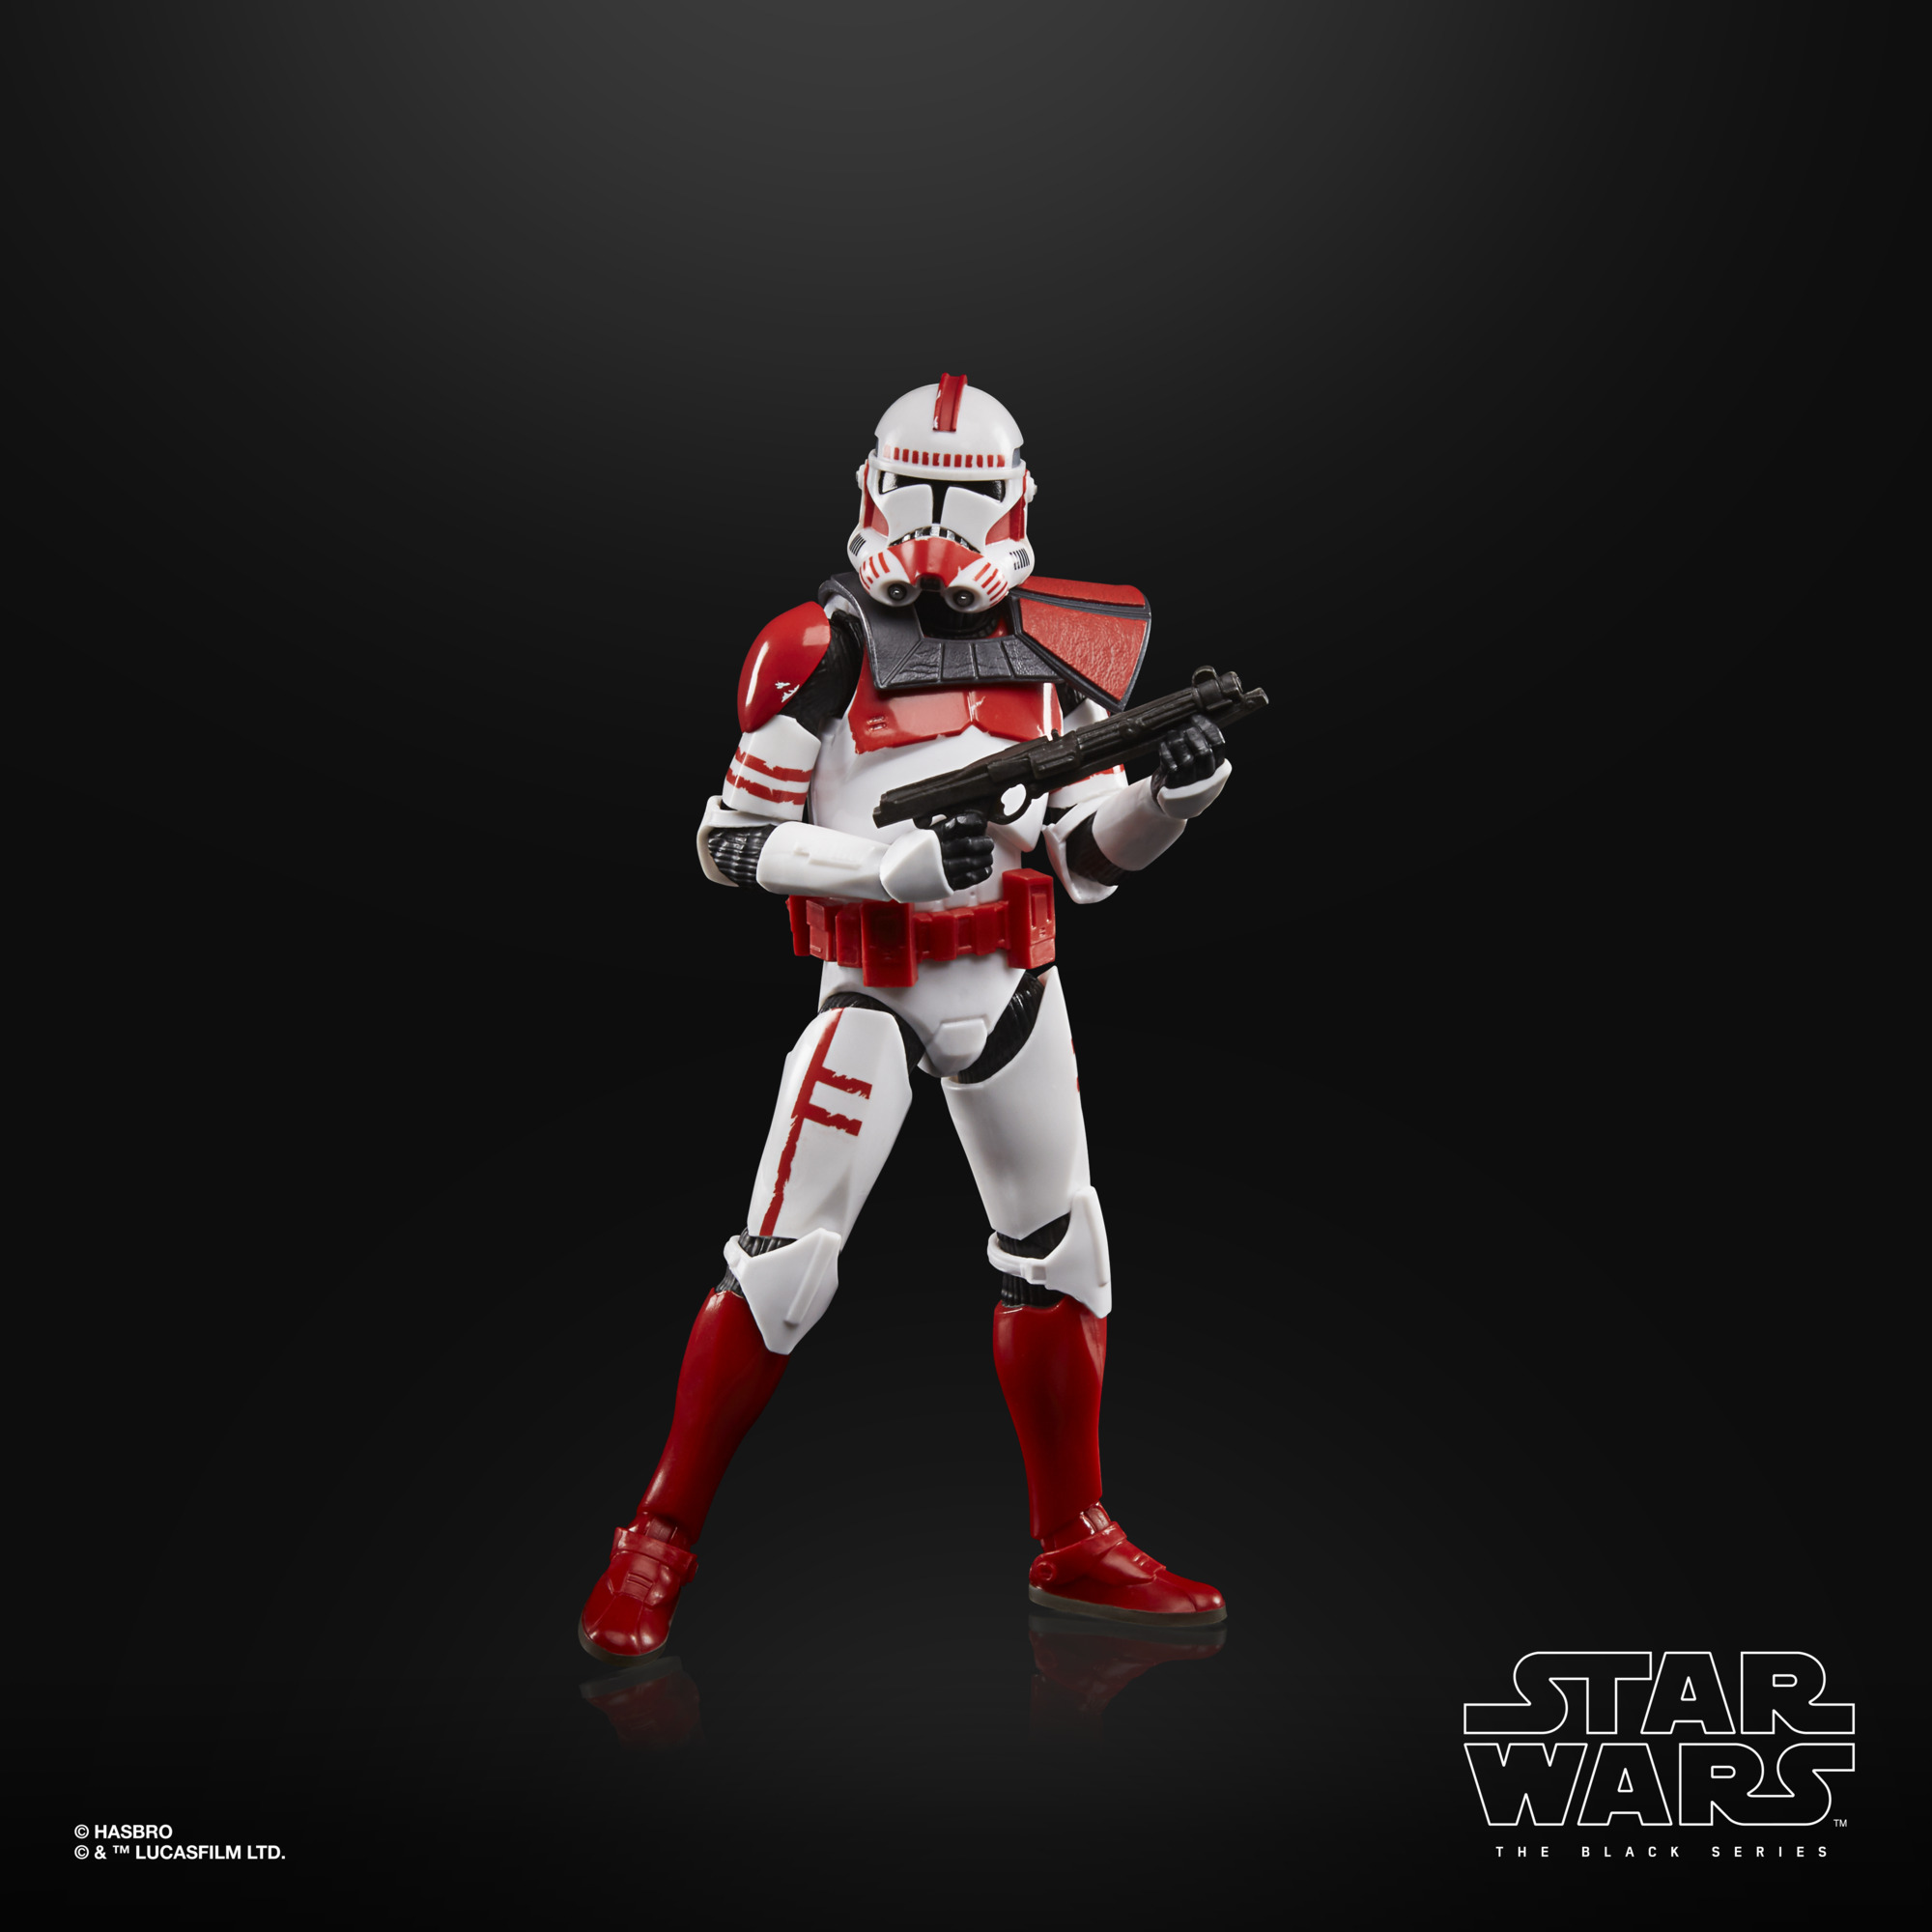 Star Wars The Black Series Imperial Clone Shock Trooper F29315L00 5010993874323